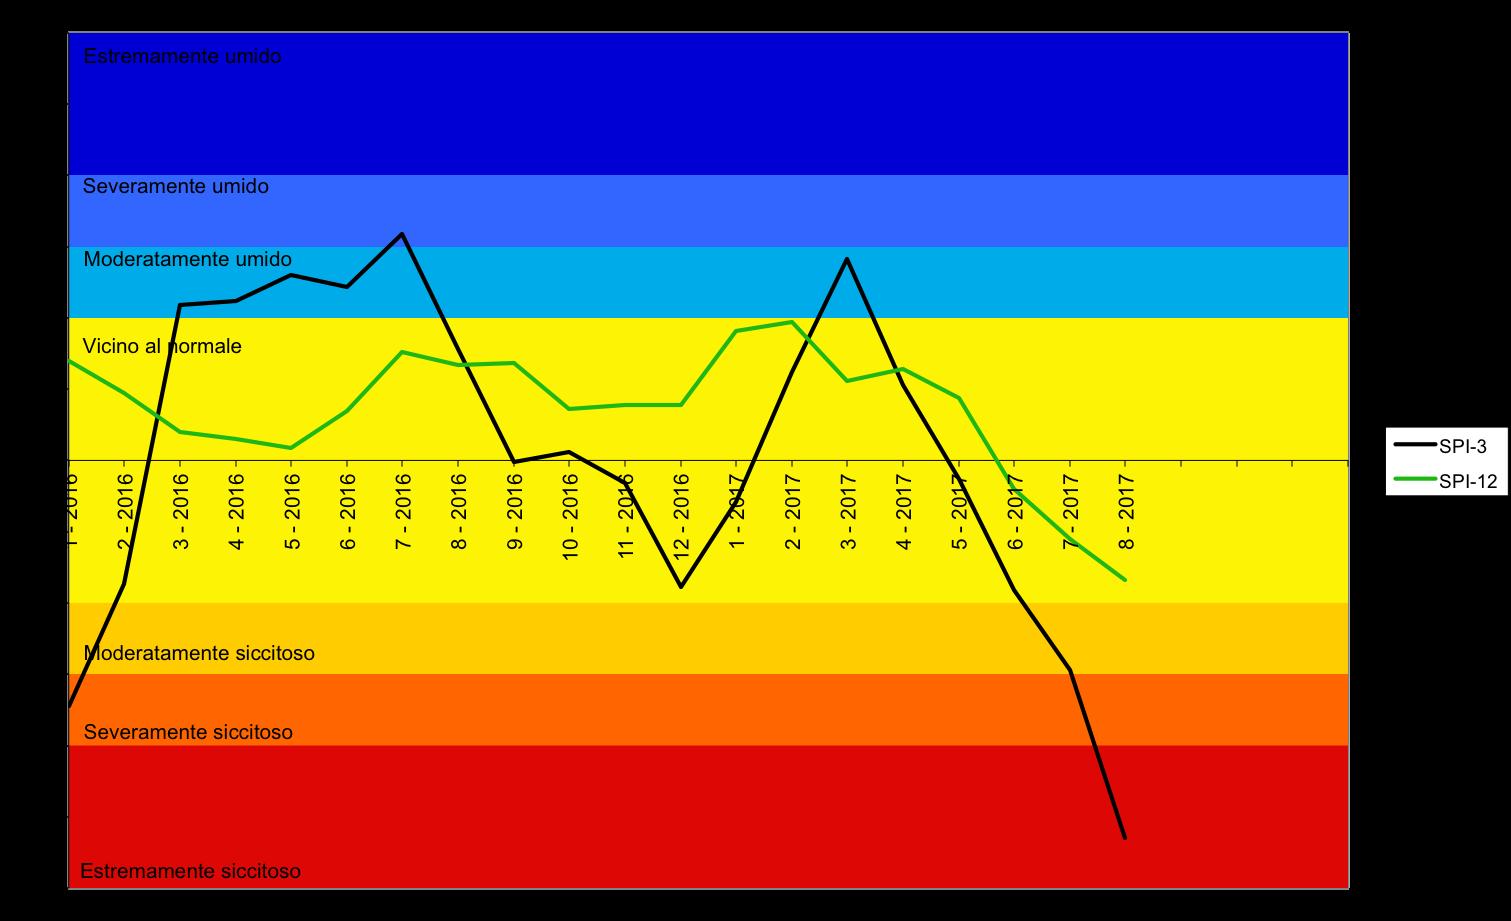 Meteo ASSAM Marche - indice SPI 2016 2017